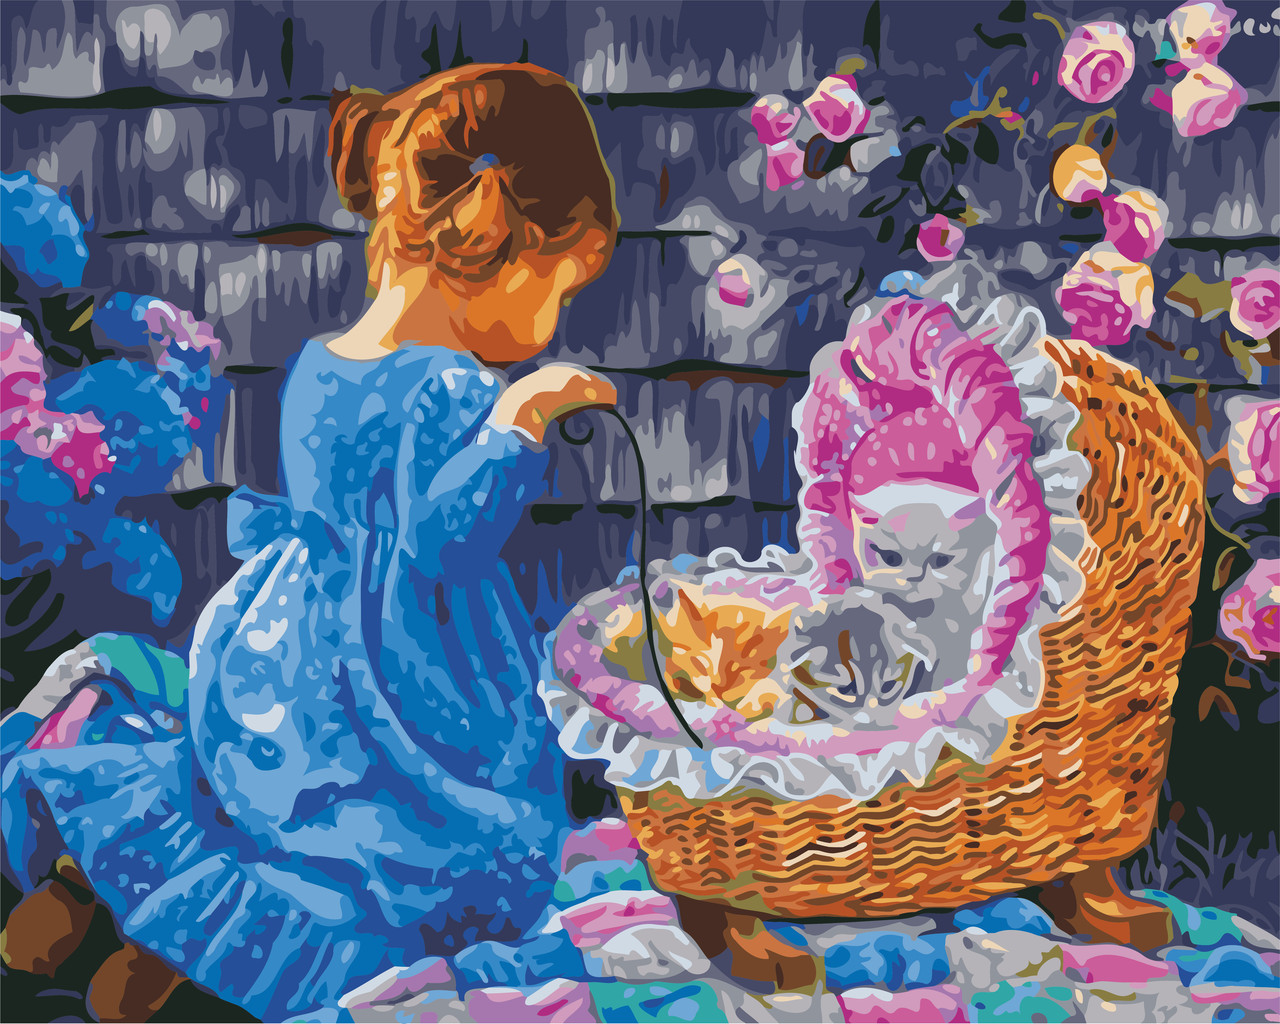 Картина по номерам Дочки-матери 40 х 50 см (AS0634)